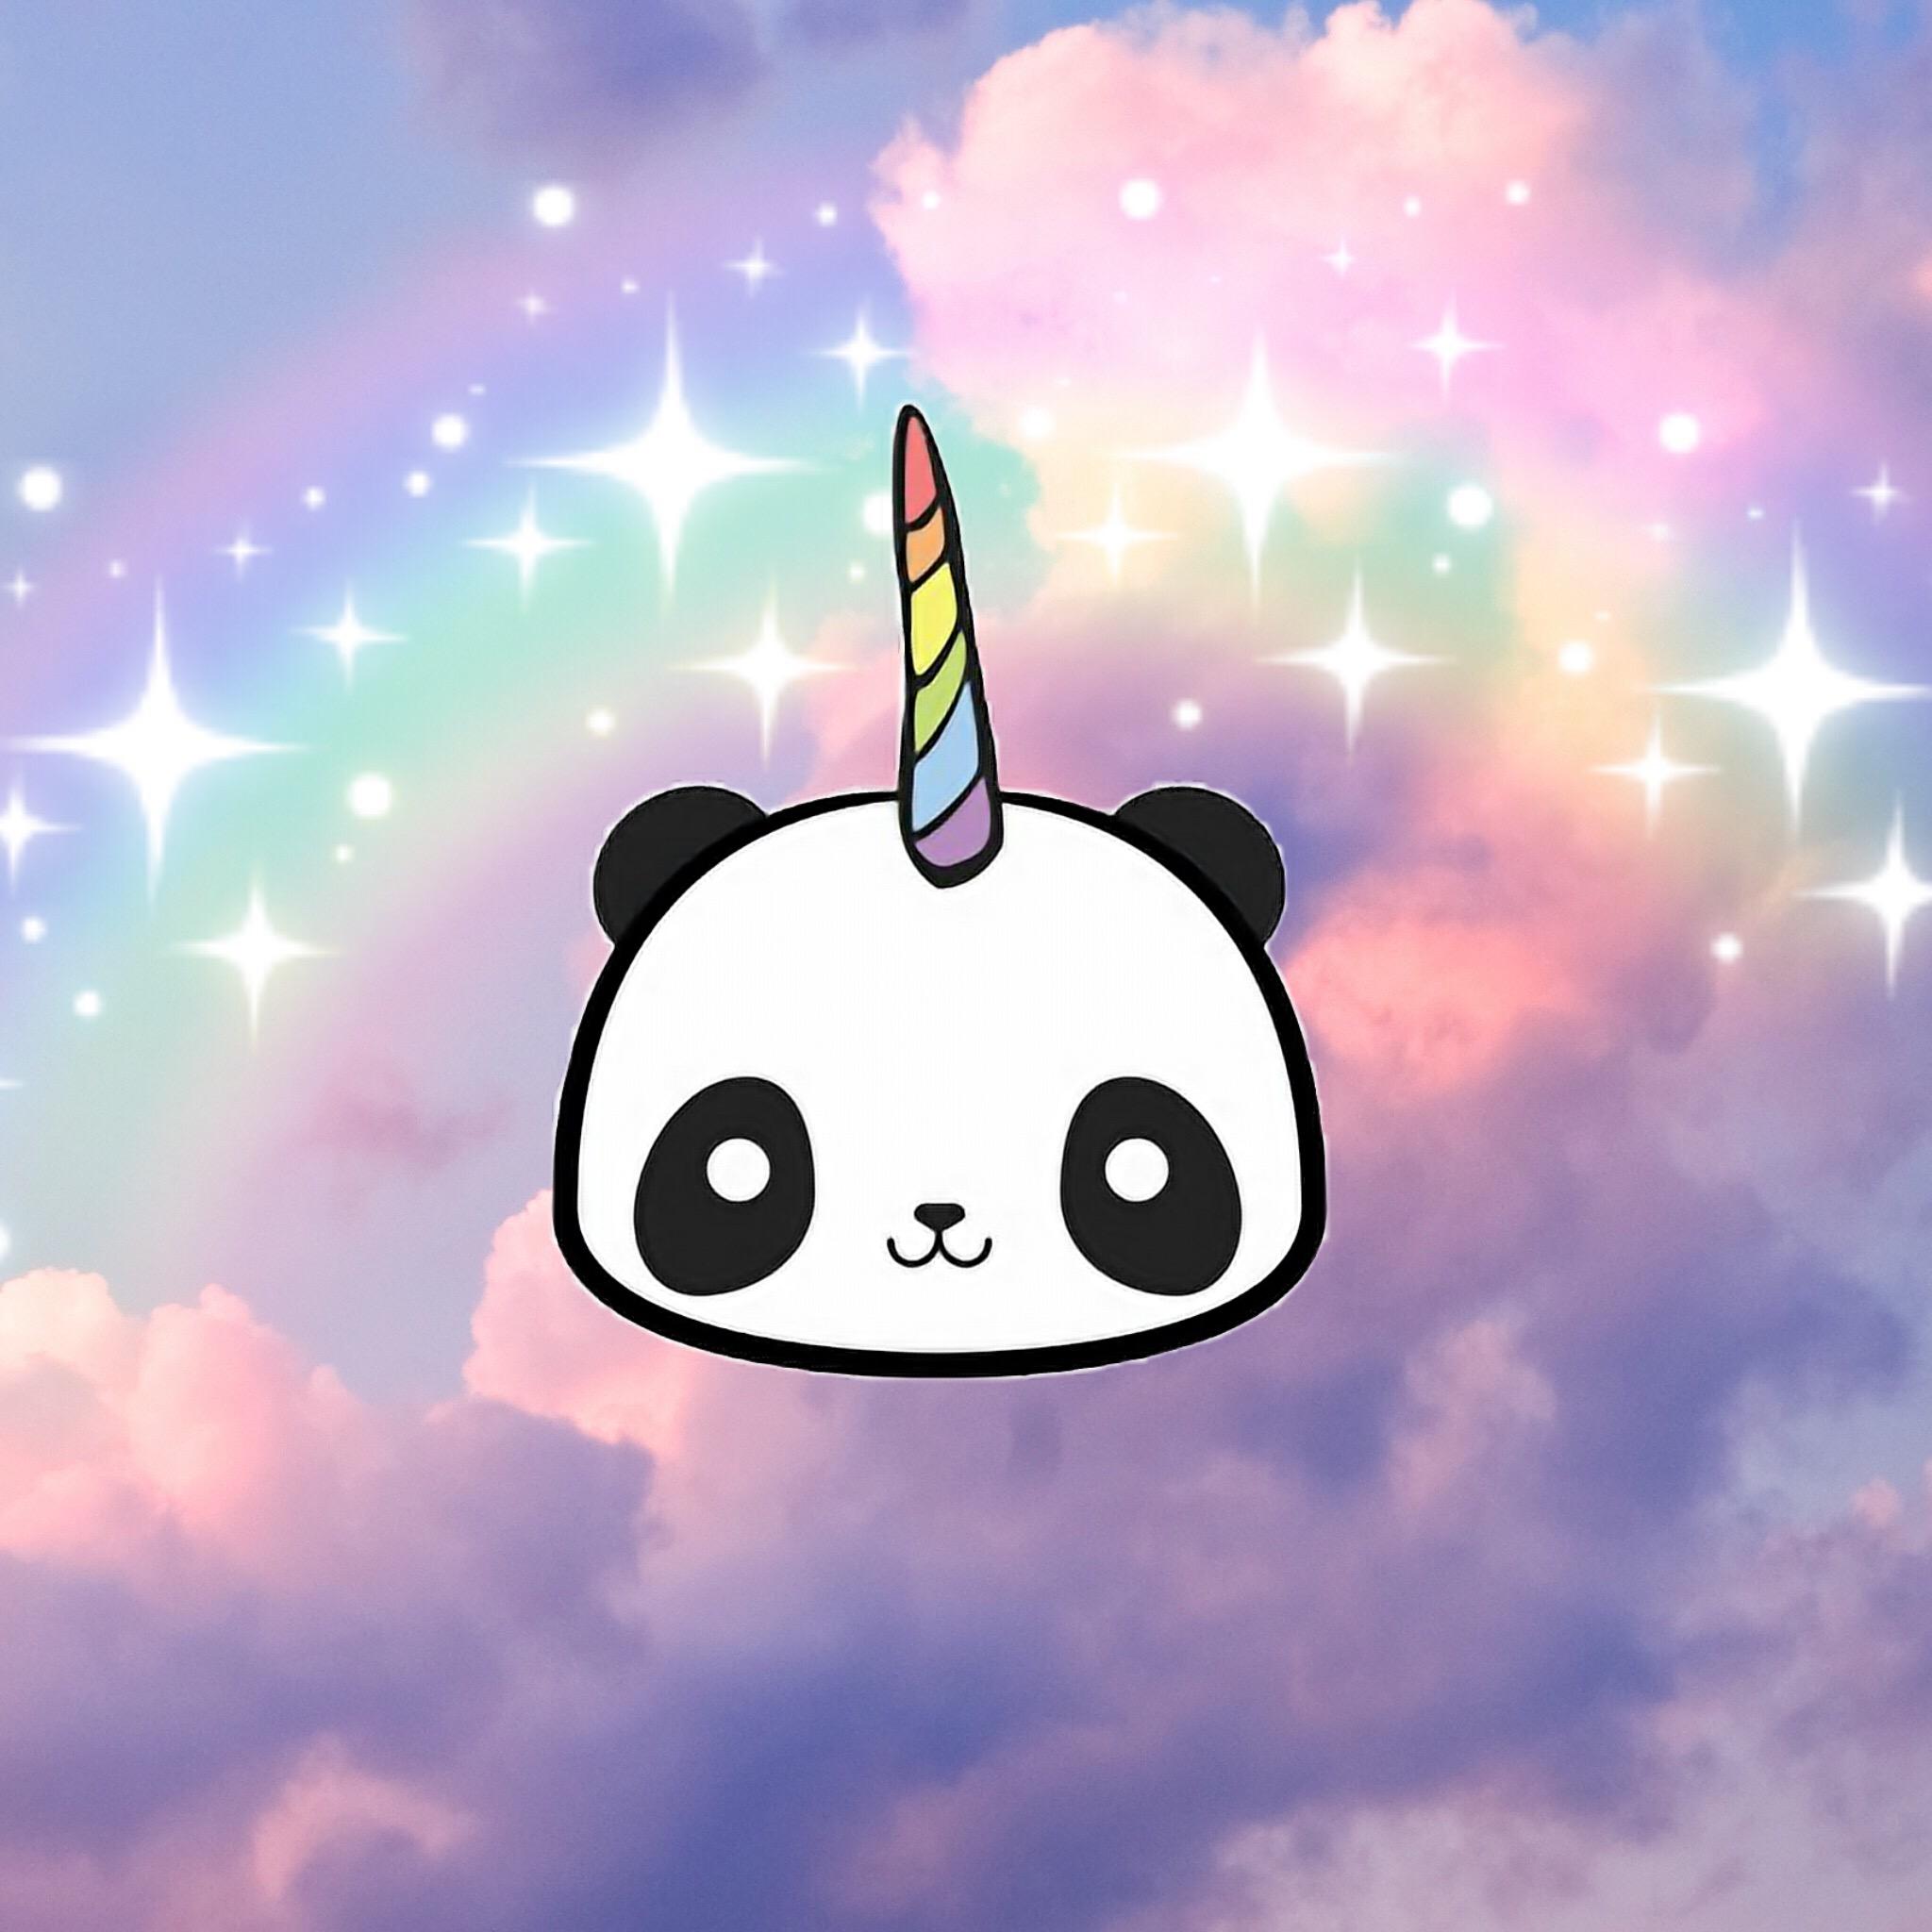 freetoedit remix remixit panda unicorn pandacorn black thanks clip art png thanks clip art animals